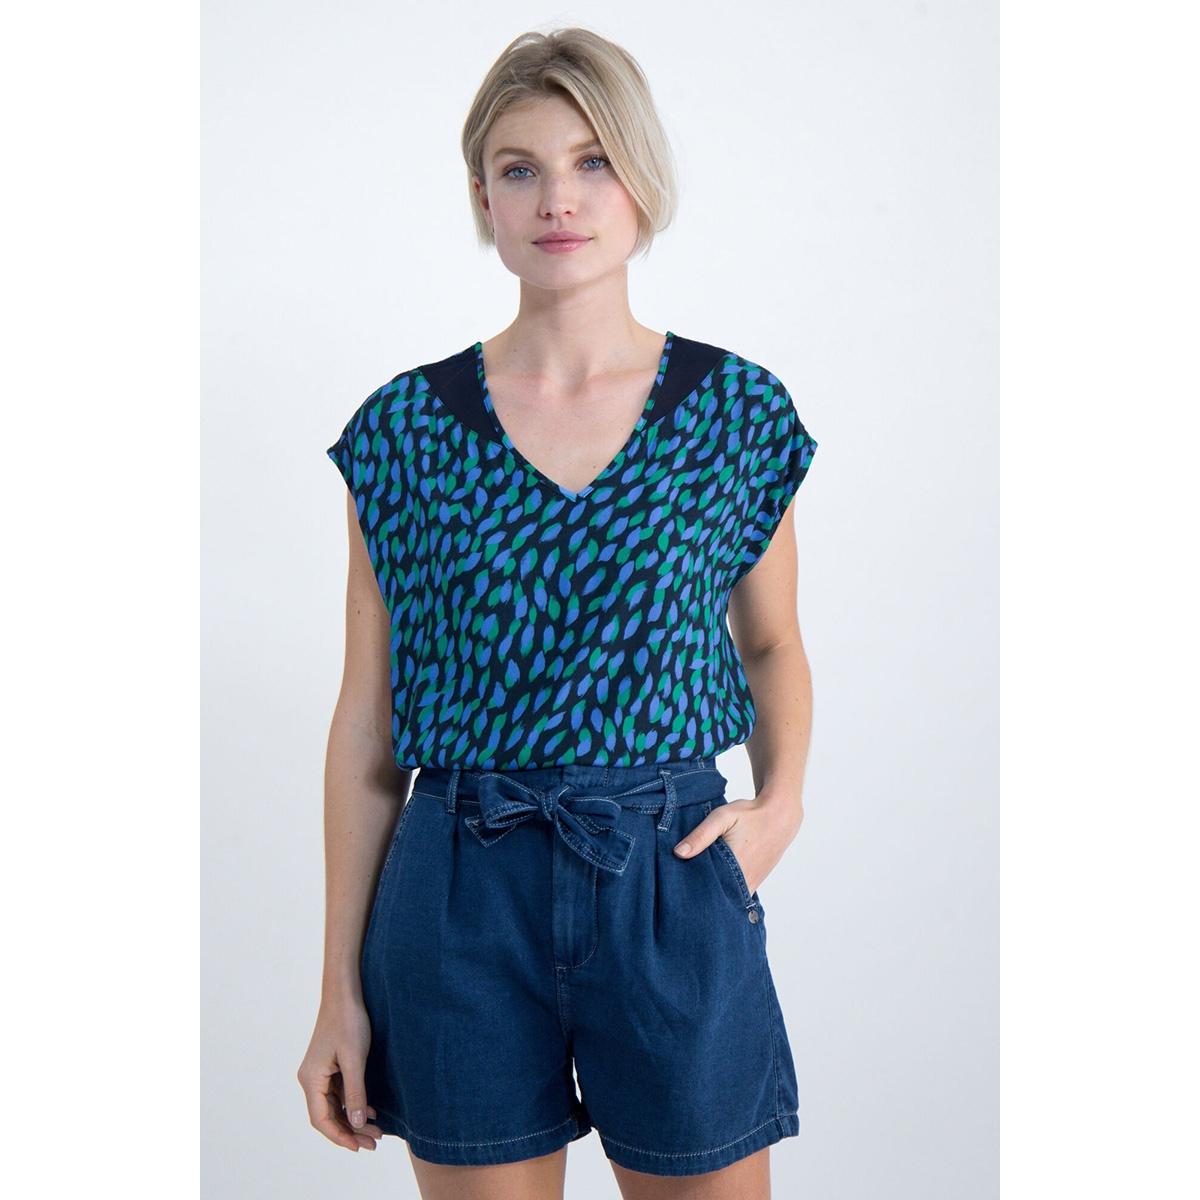 blousetop met all over print o00032 garcia t-shirt 292 dark moon